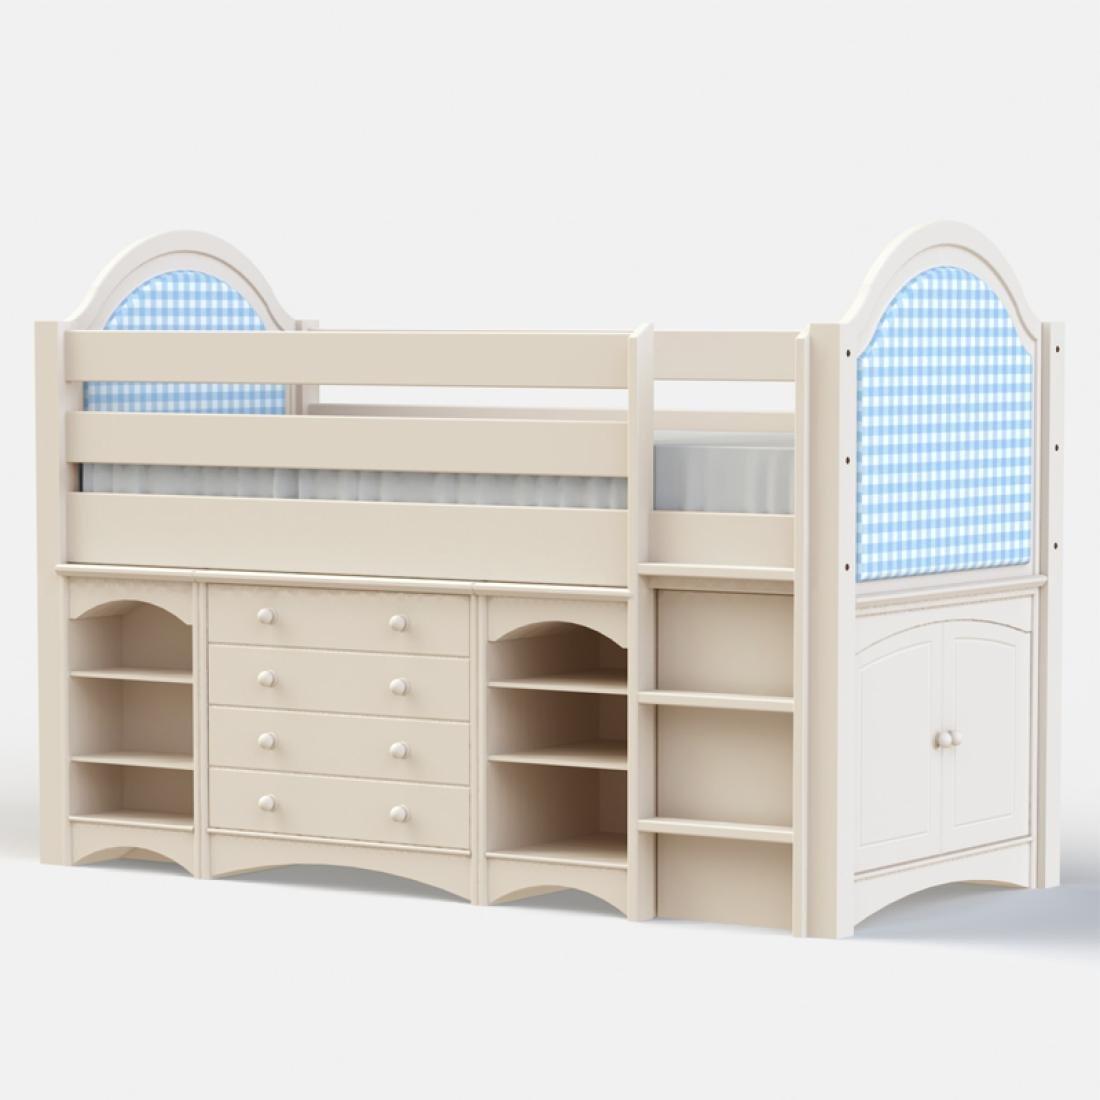 Small Box Room Cabin Bed For Grandma: Sammy Boys Cabin Bed